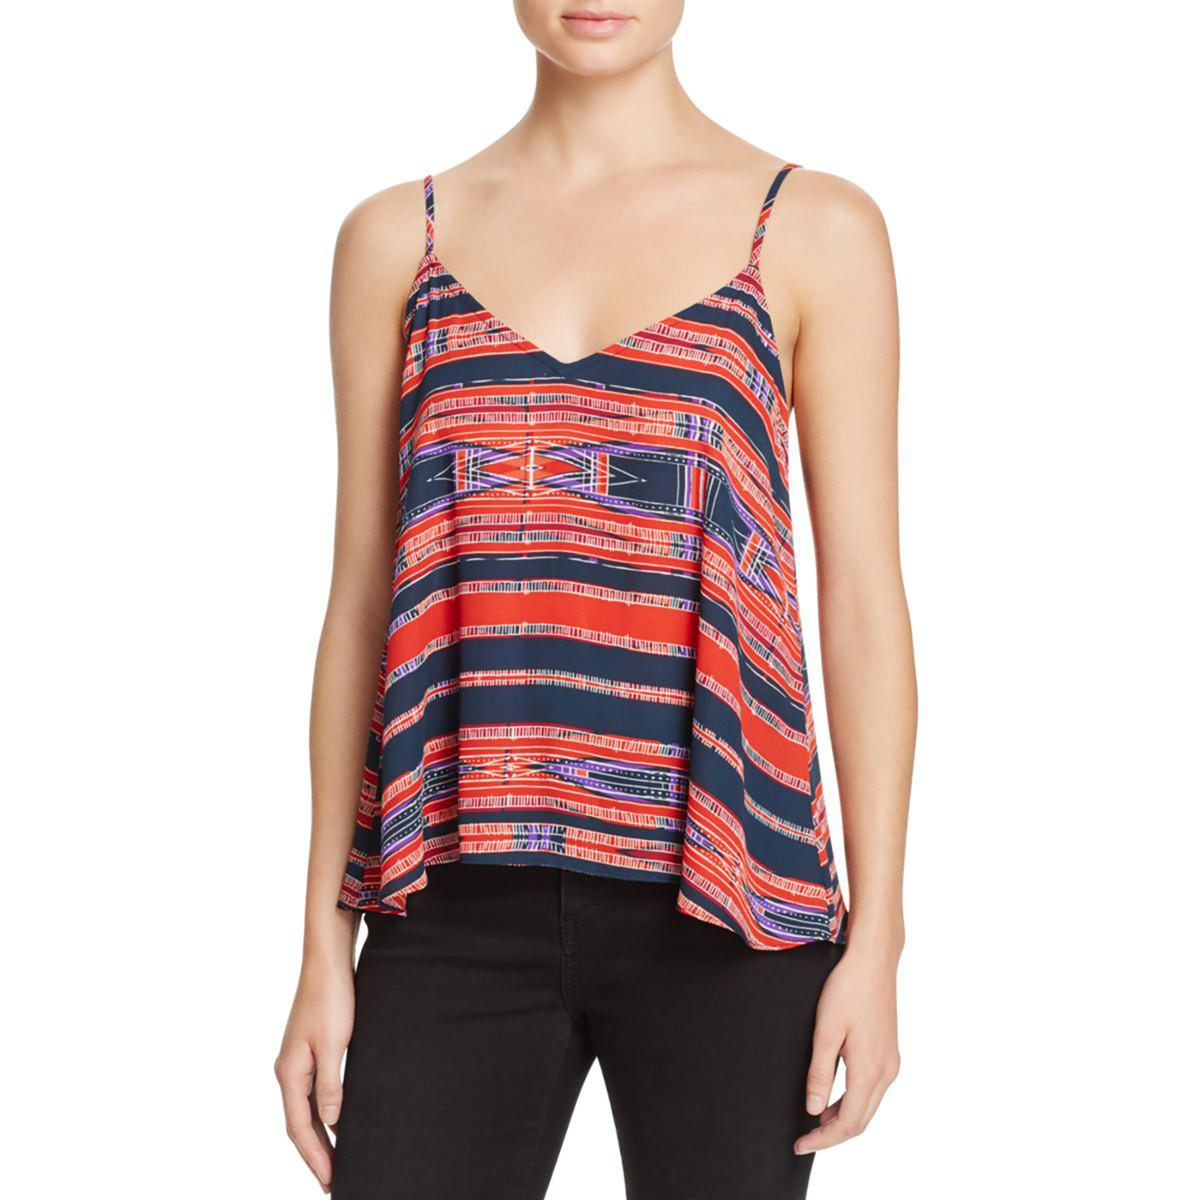 Aqua Womens Orange Chiffon Contrast Trim Camisole Top S BHFO 7526